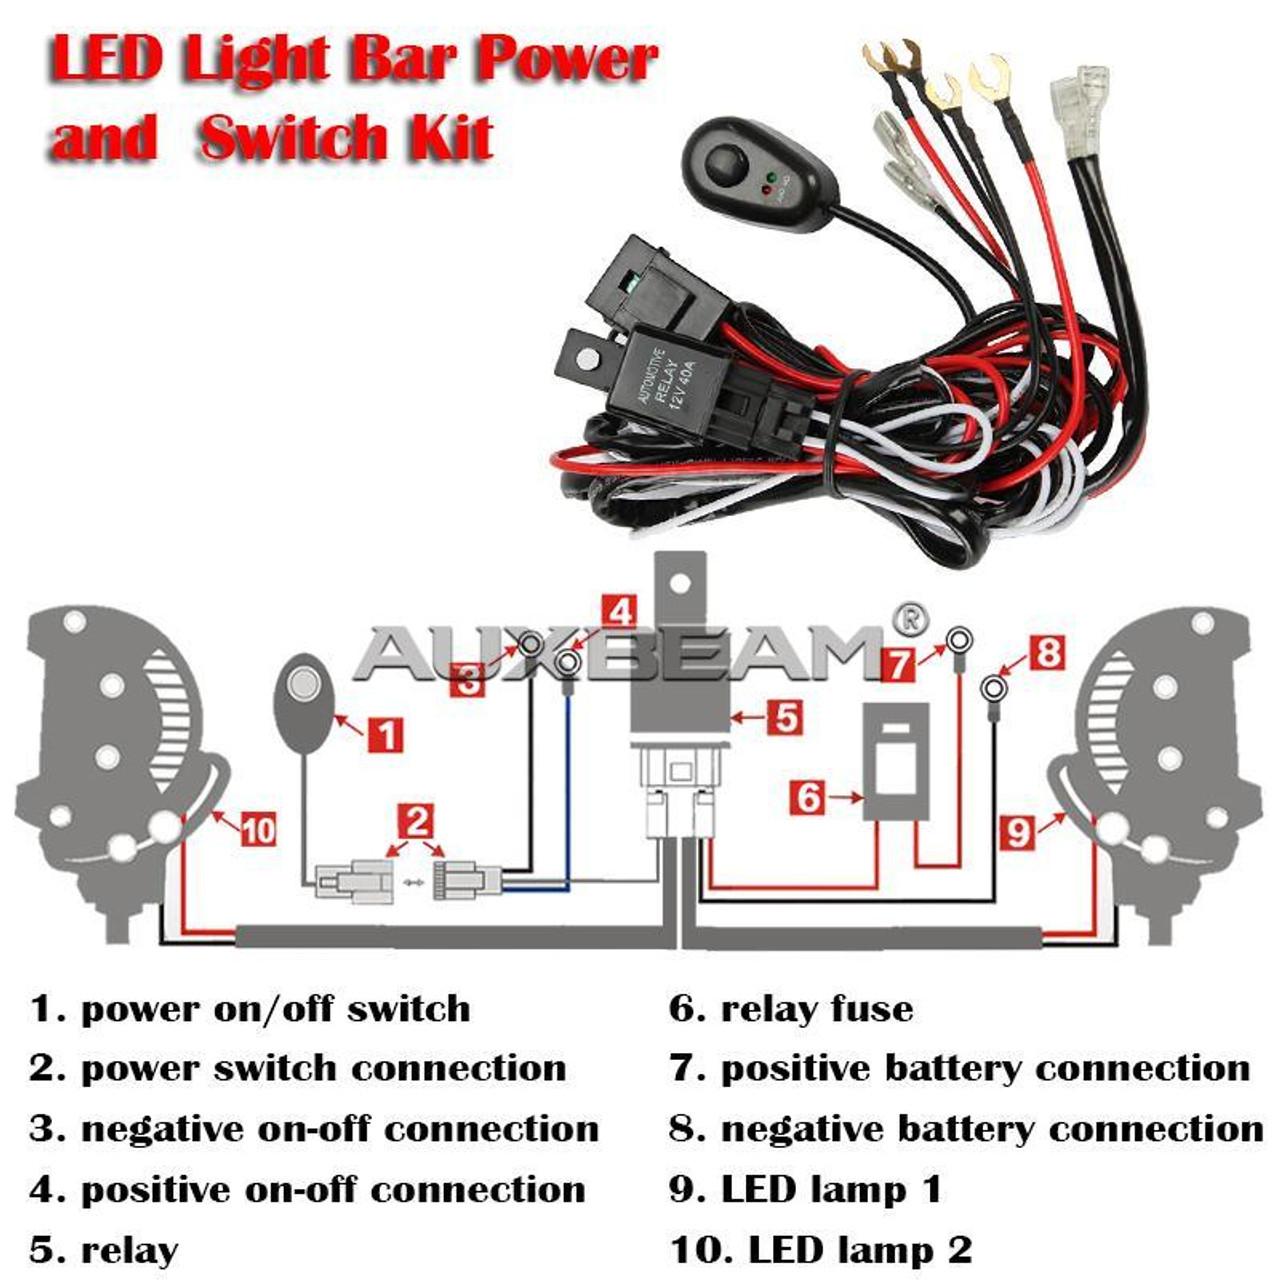 12v 40a led light bar wiring harness kit (dual lights12v 40a led light bar wiring harness kit (dual lights)